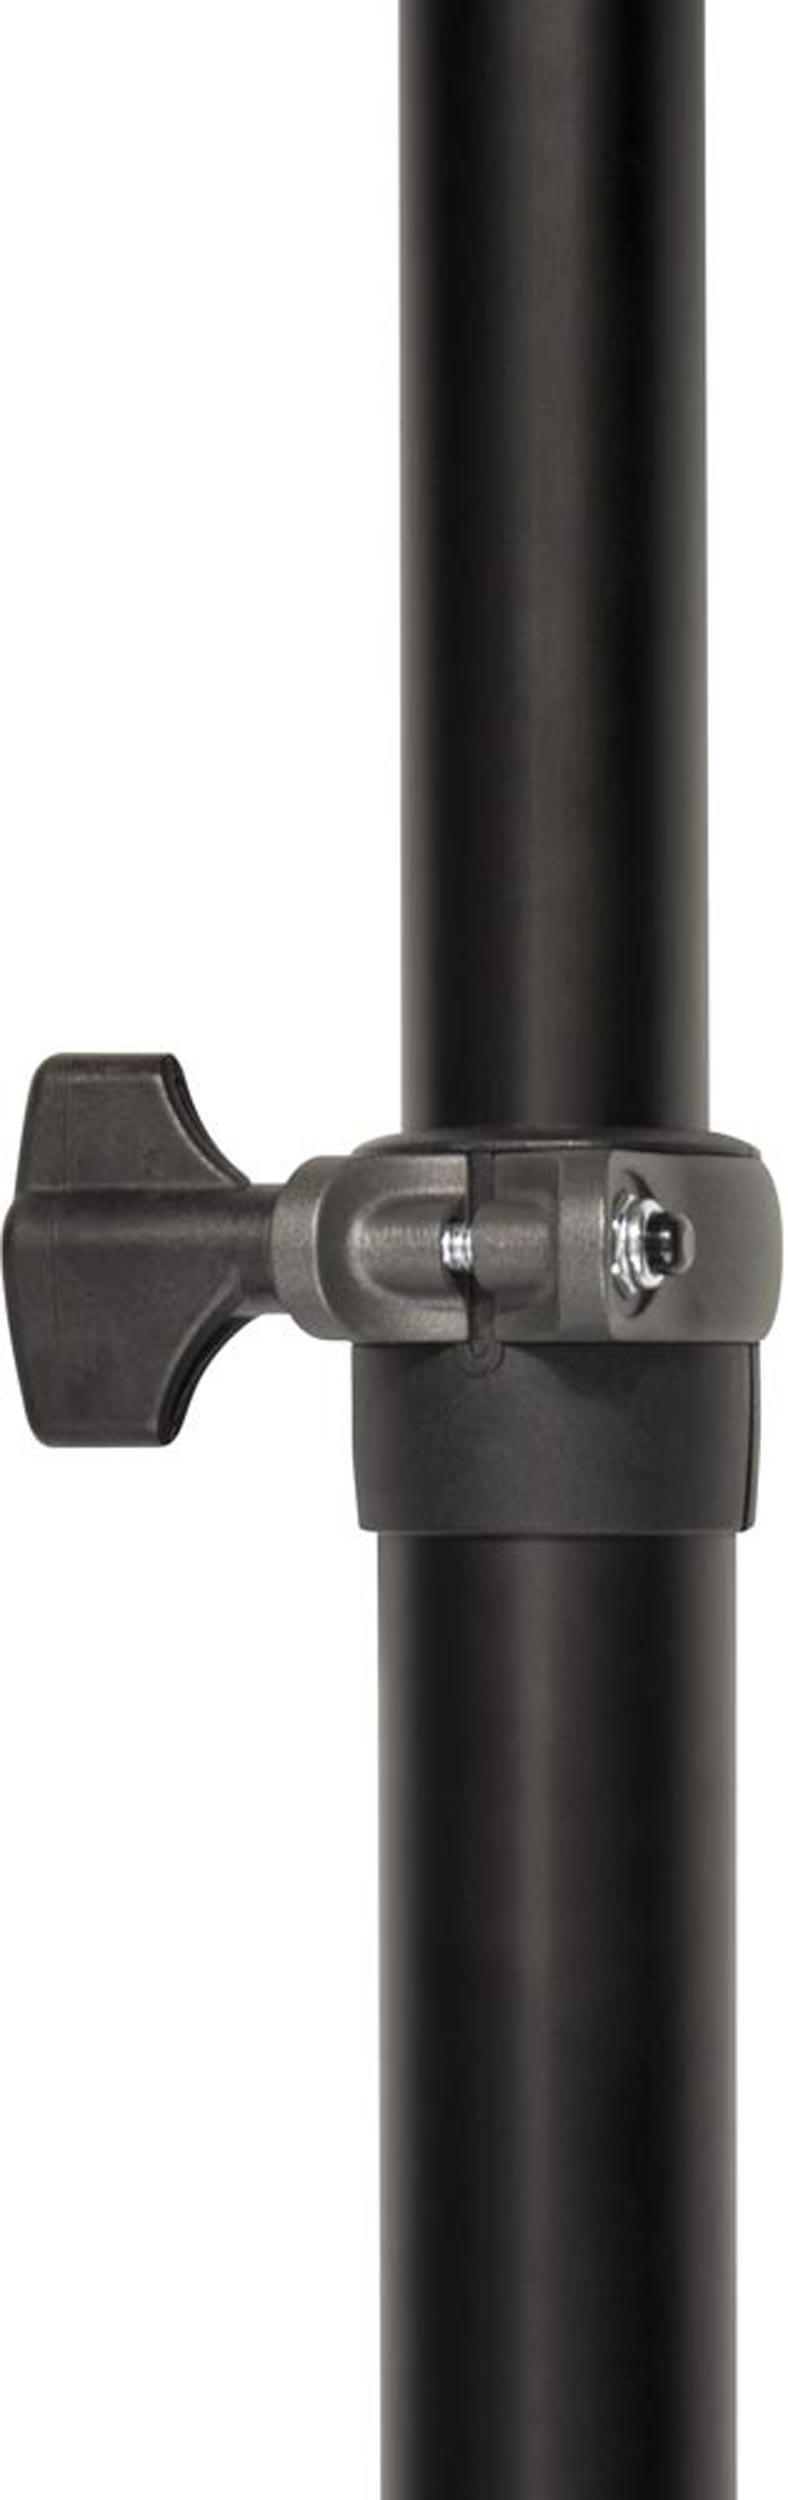 Ultimate Support Sp 80 Original Series Sub Speaker Pole